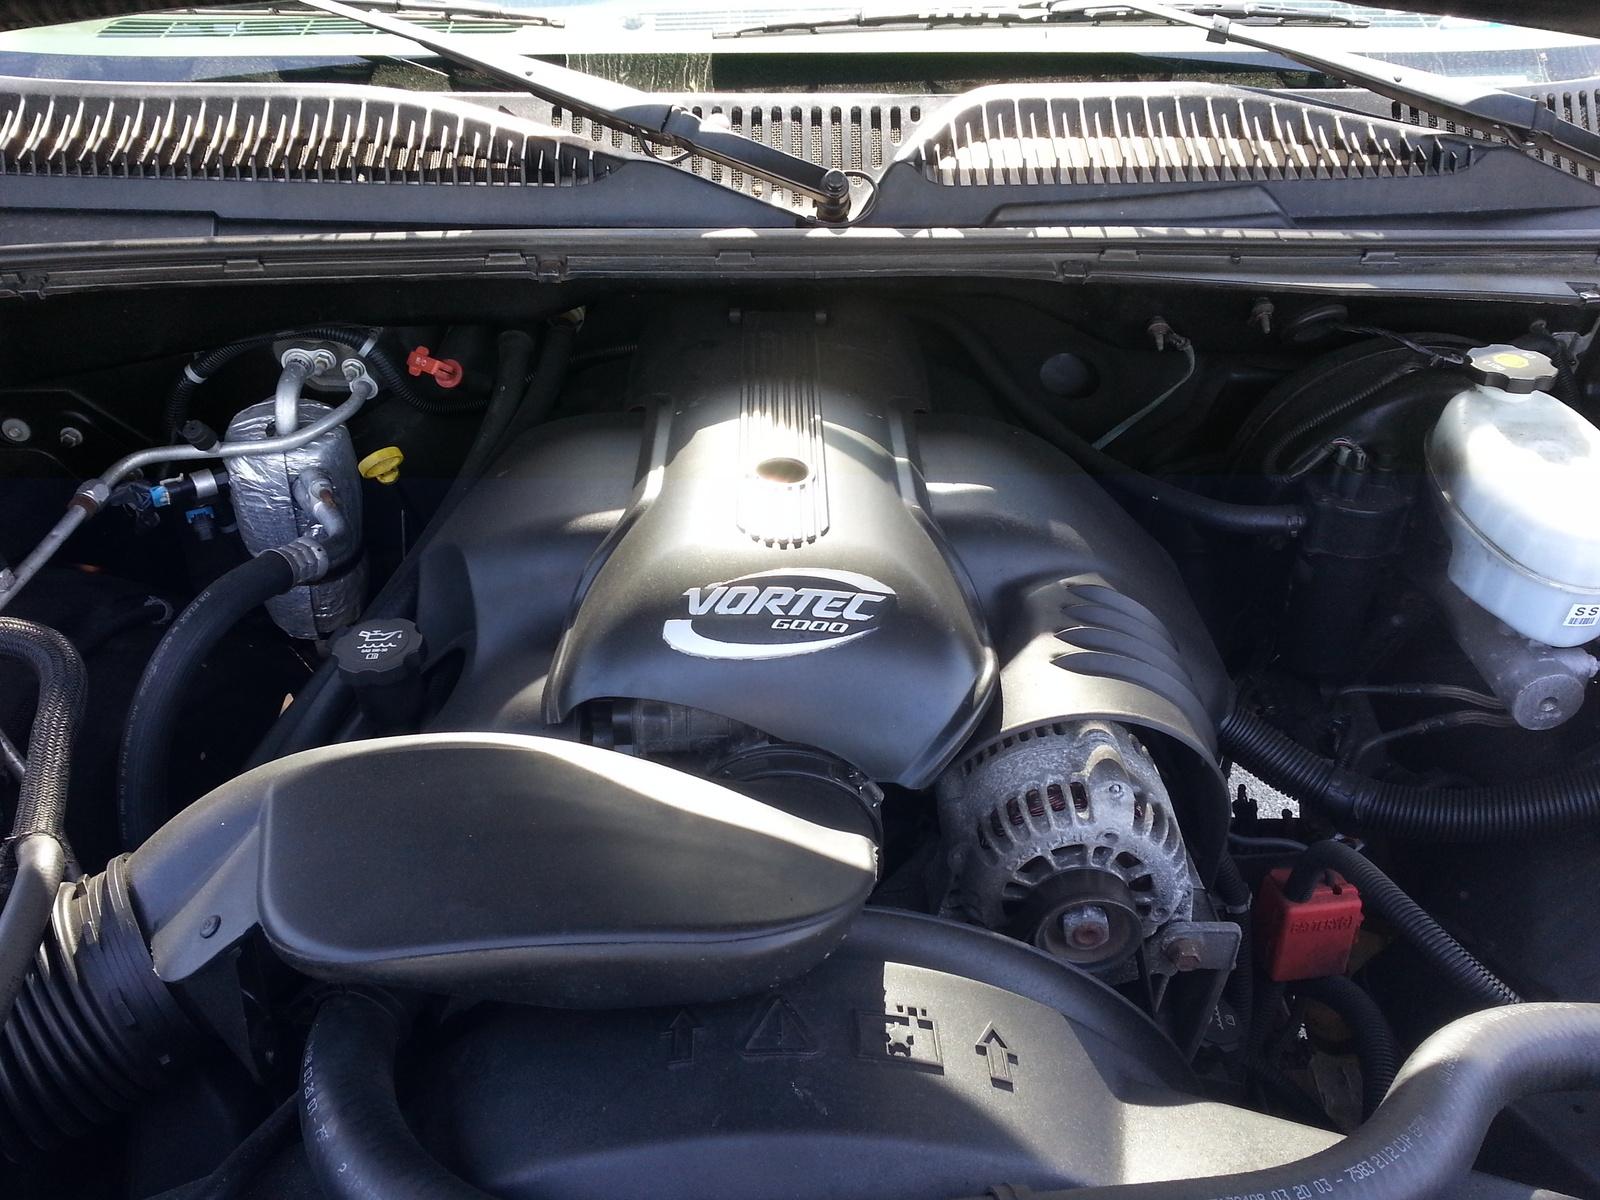 1994 Chrysler Lhs Engine Wiring Diagram